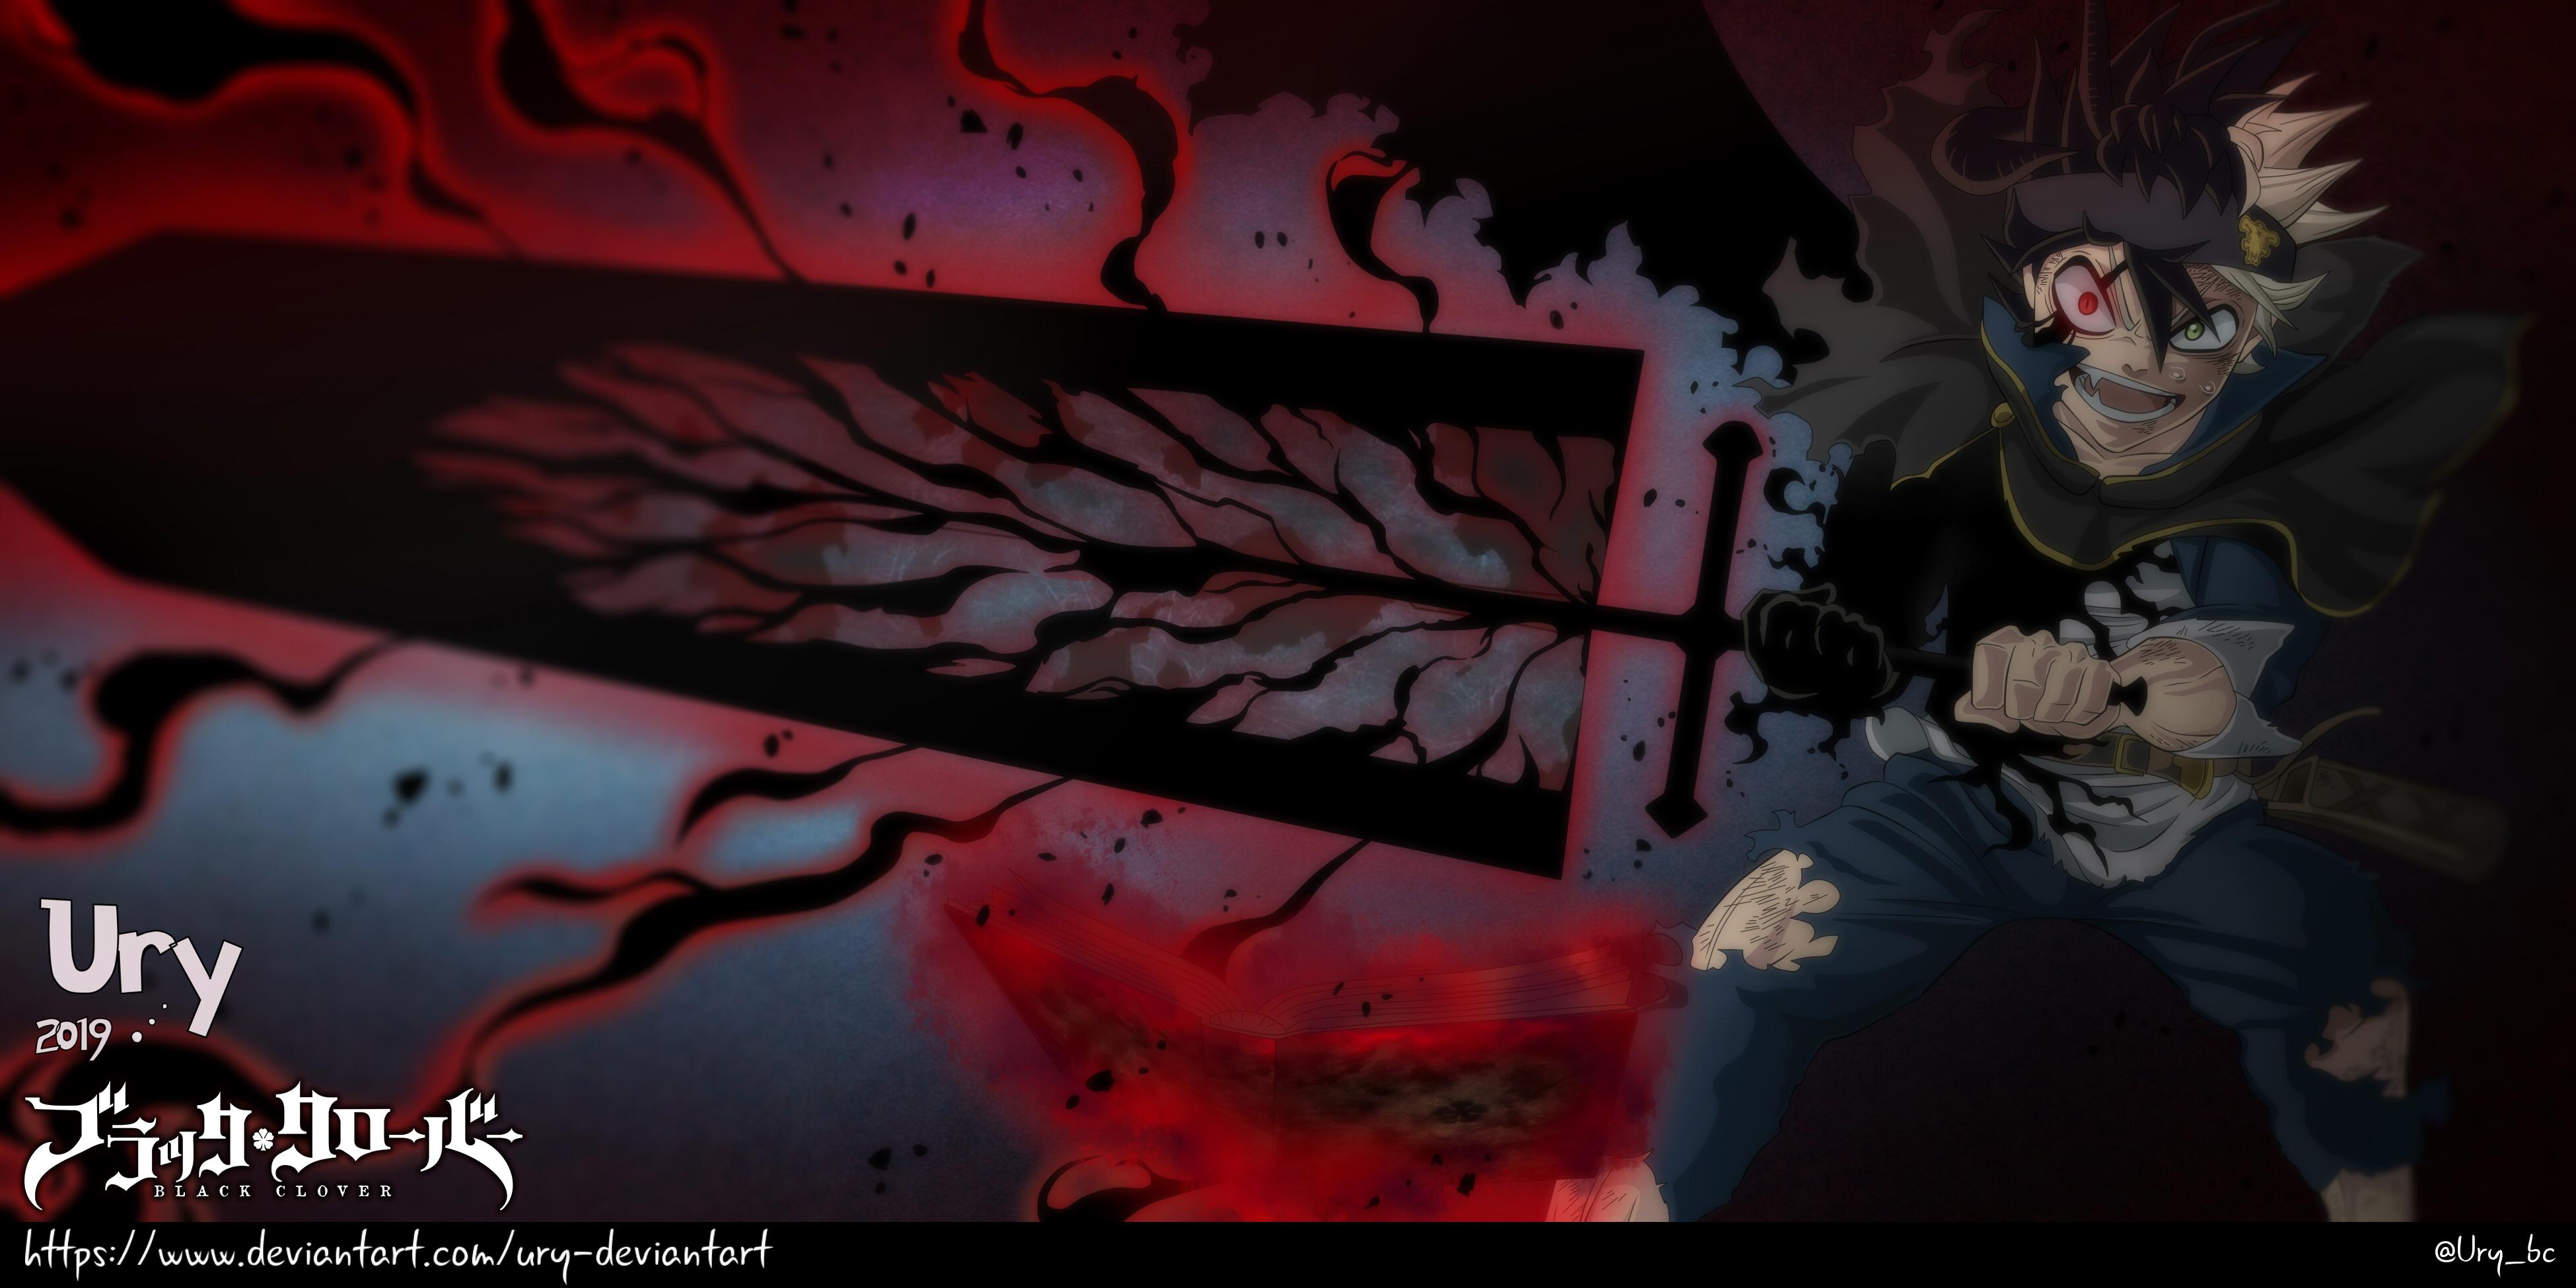 Black Clover 208 Asta Black Divider By Ury Deviantart On Deviantart Black Clover Anime Clover Digital Artist